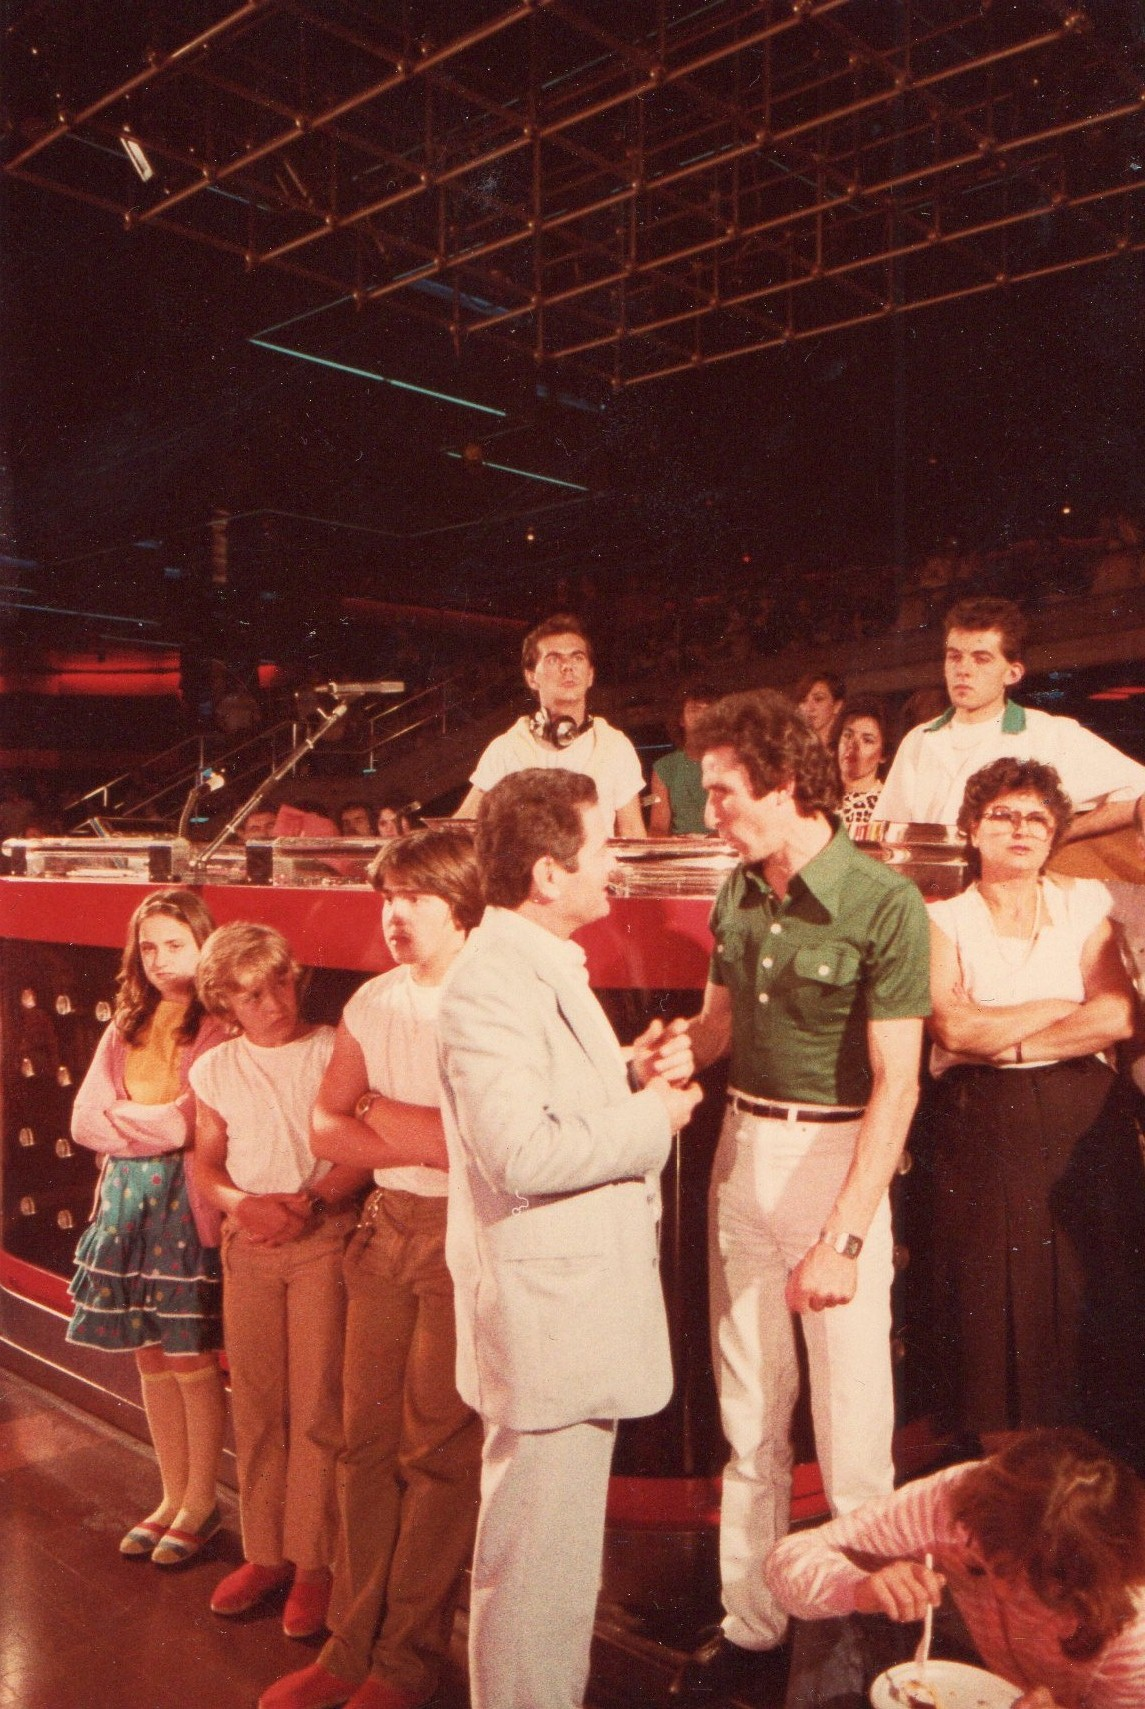 festa marabù 1985 Guido Bertoldi